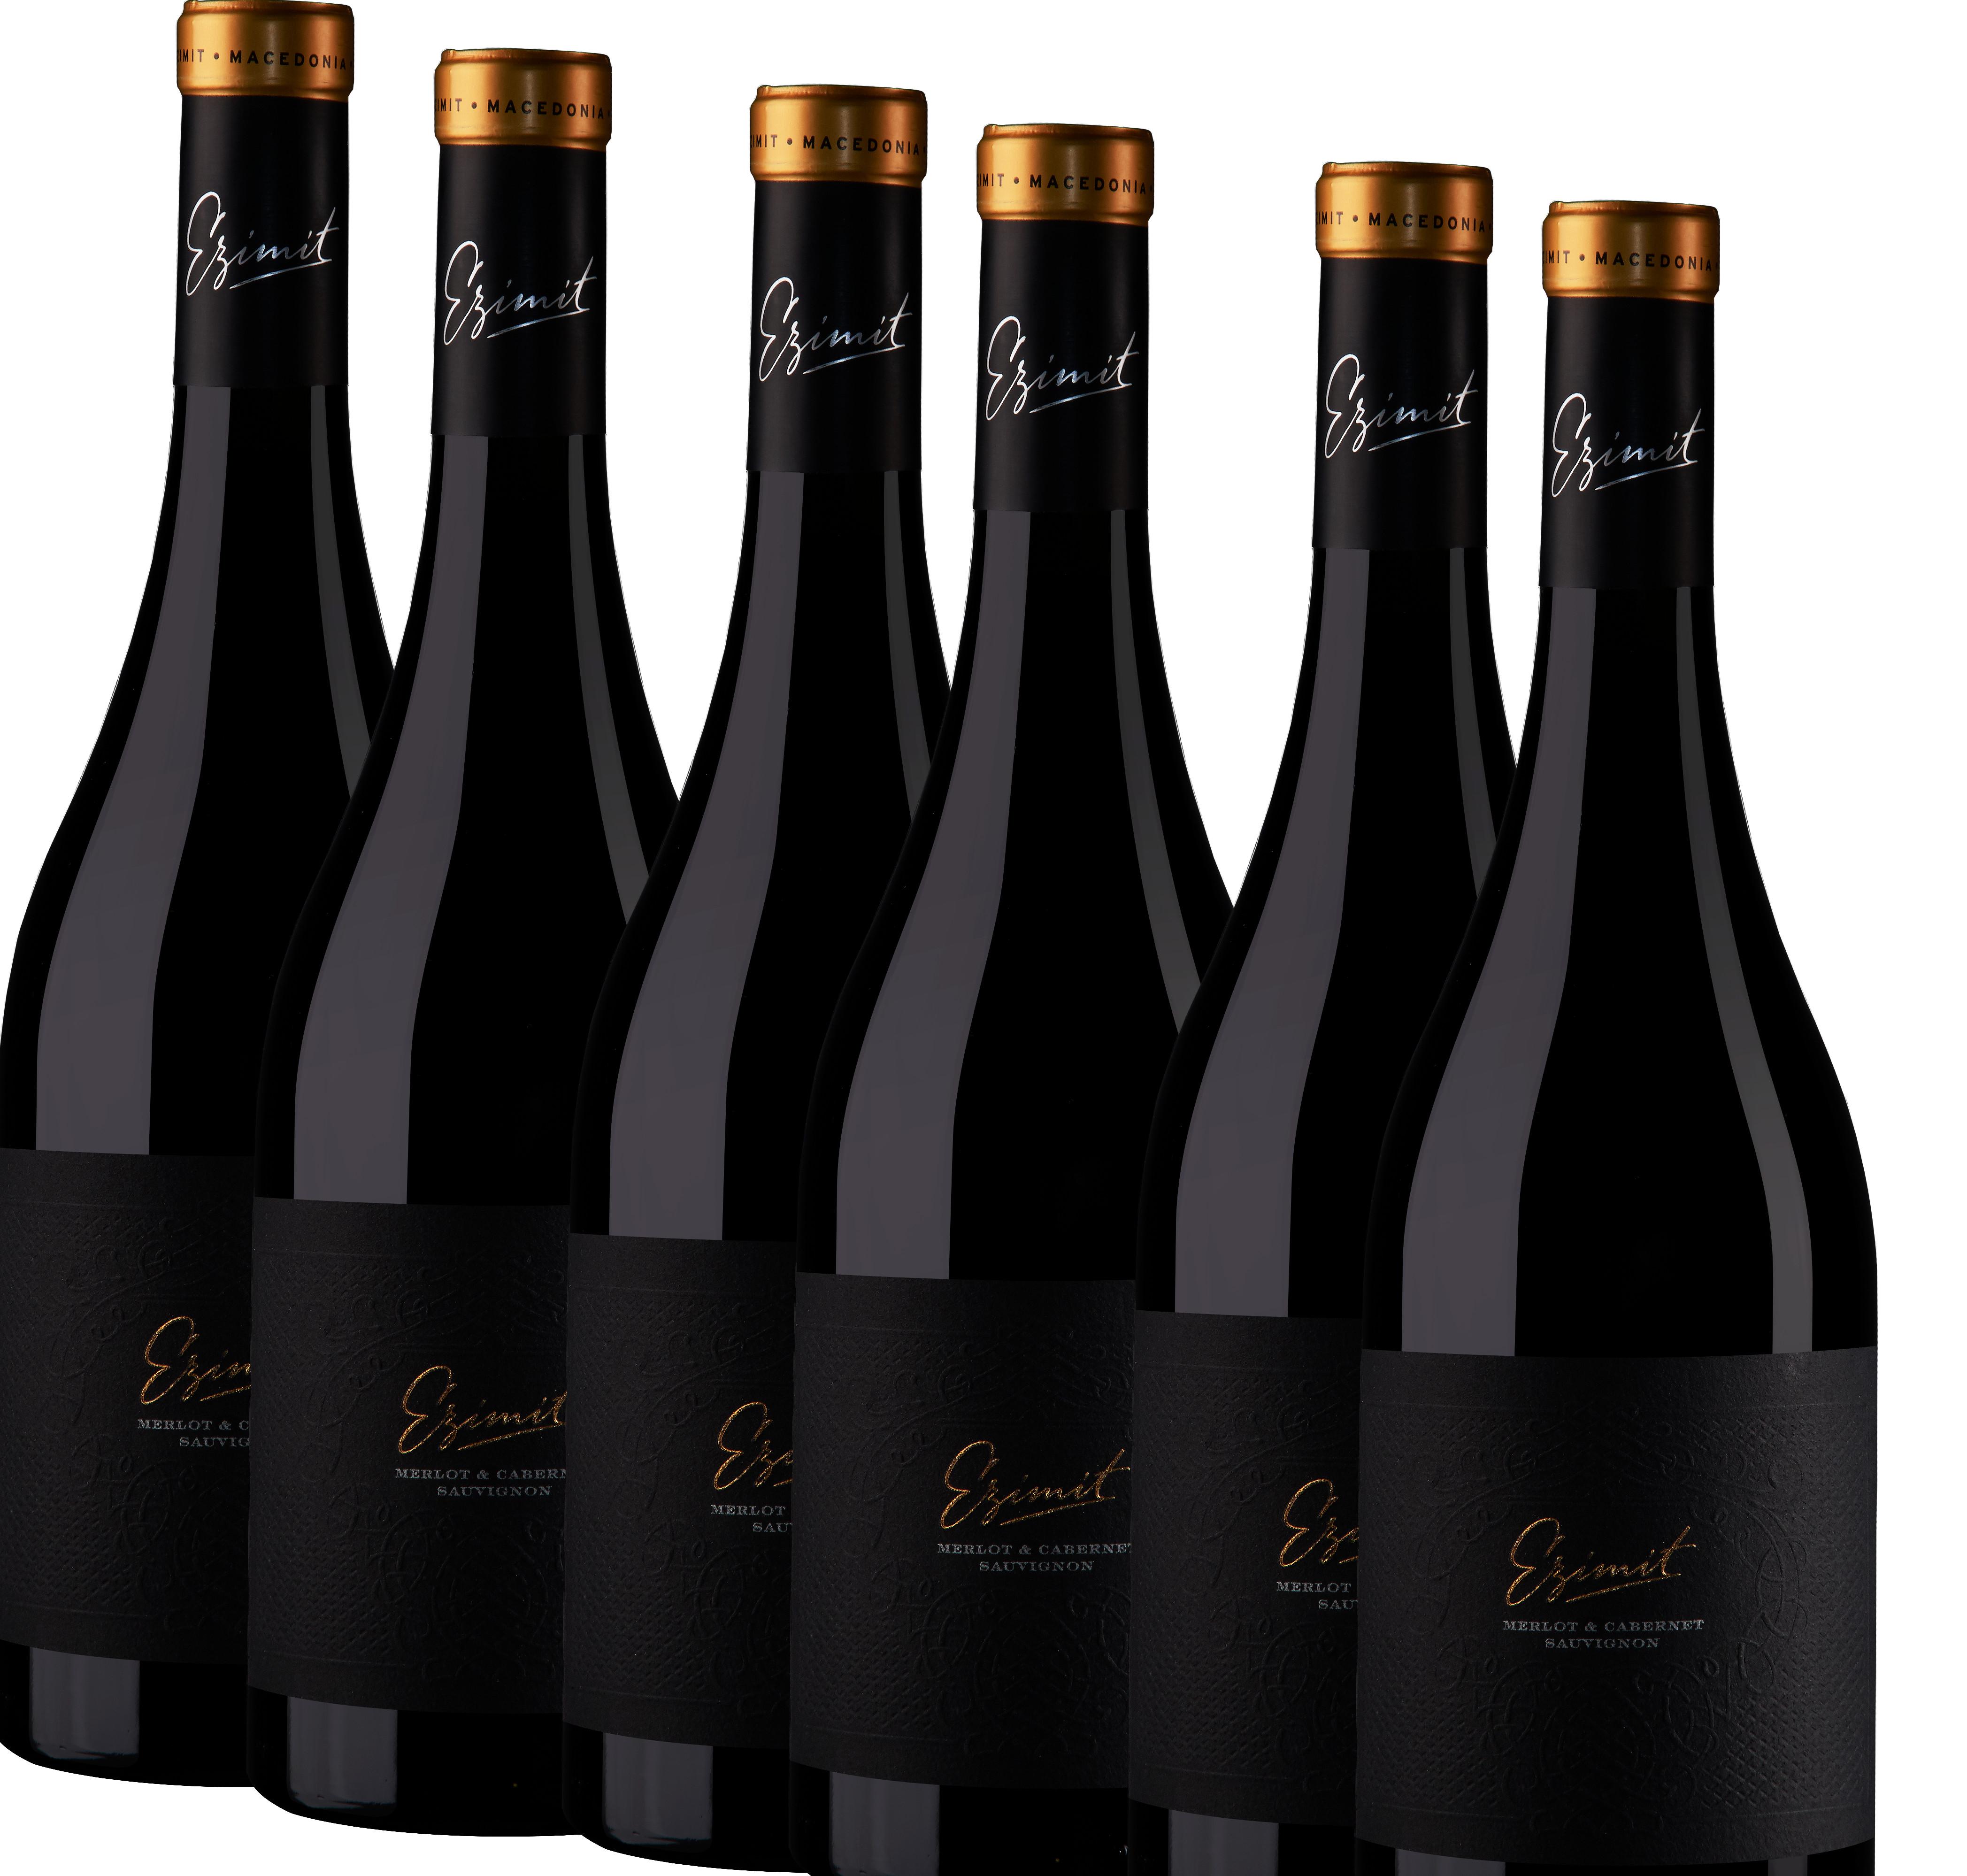 6x 0,75L Ezimit Merlot & Cabernet Sauvignon Rotwein trocken 2018 - 14,0% - 7,31€/L